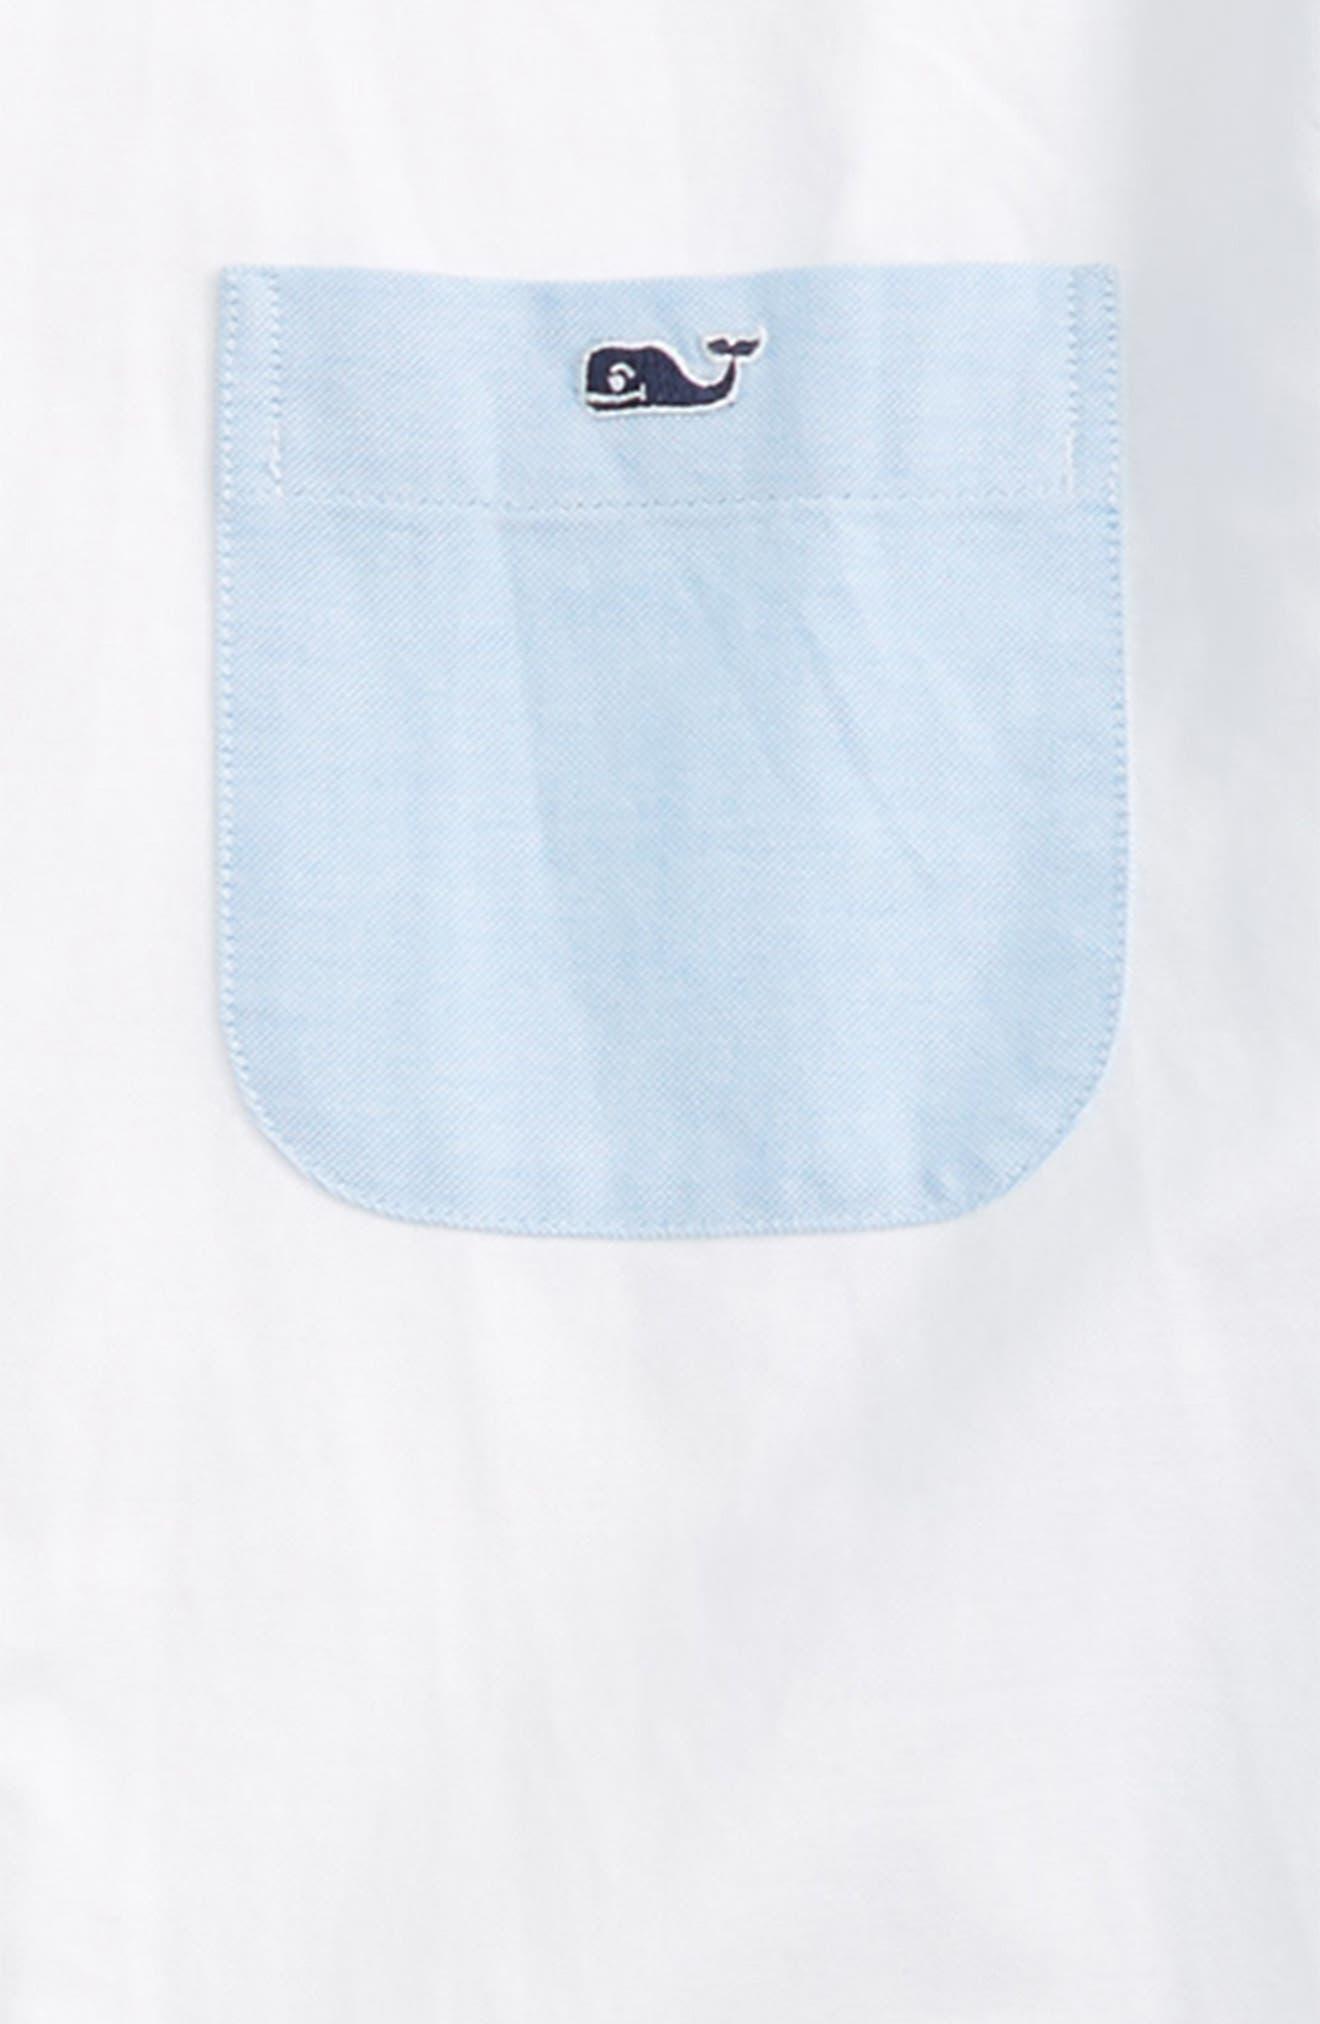 Party Whale Oxford Shirt,                             Alternate thumbnail 2, color,                             408